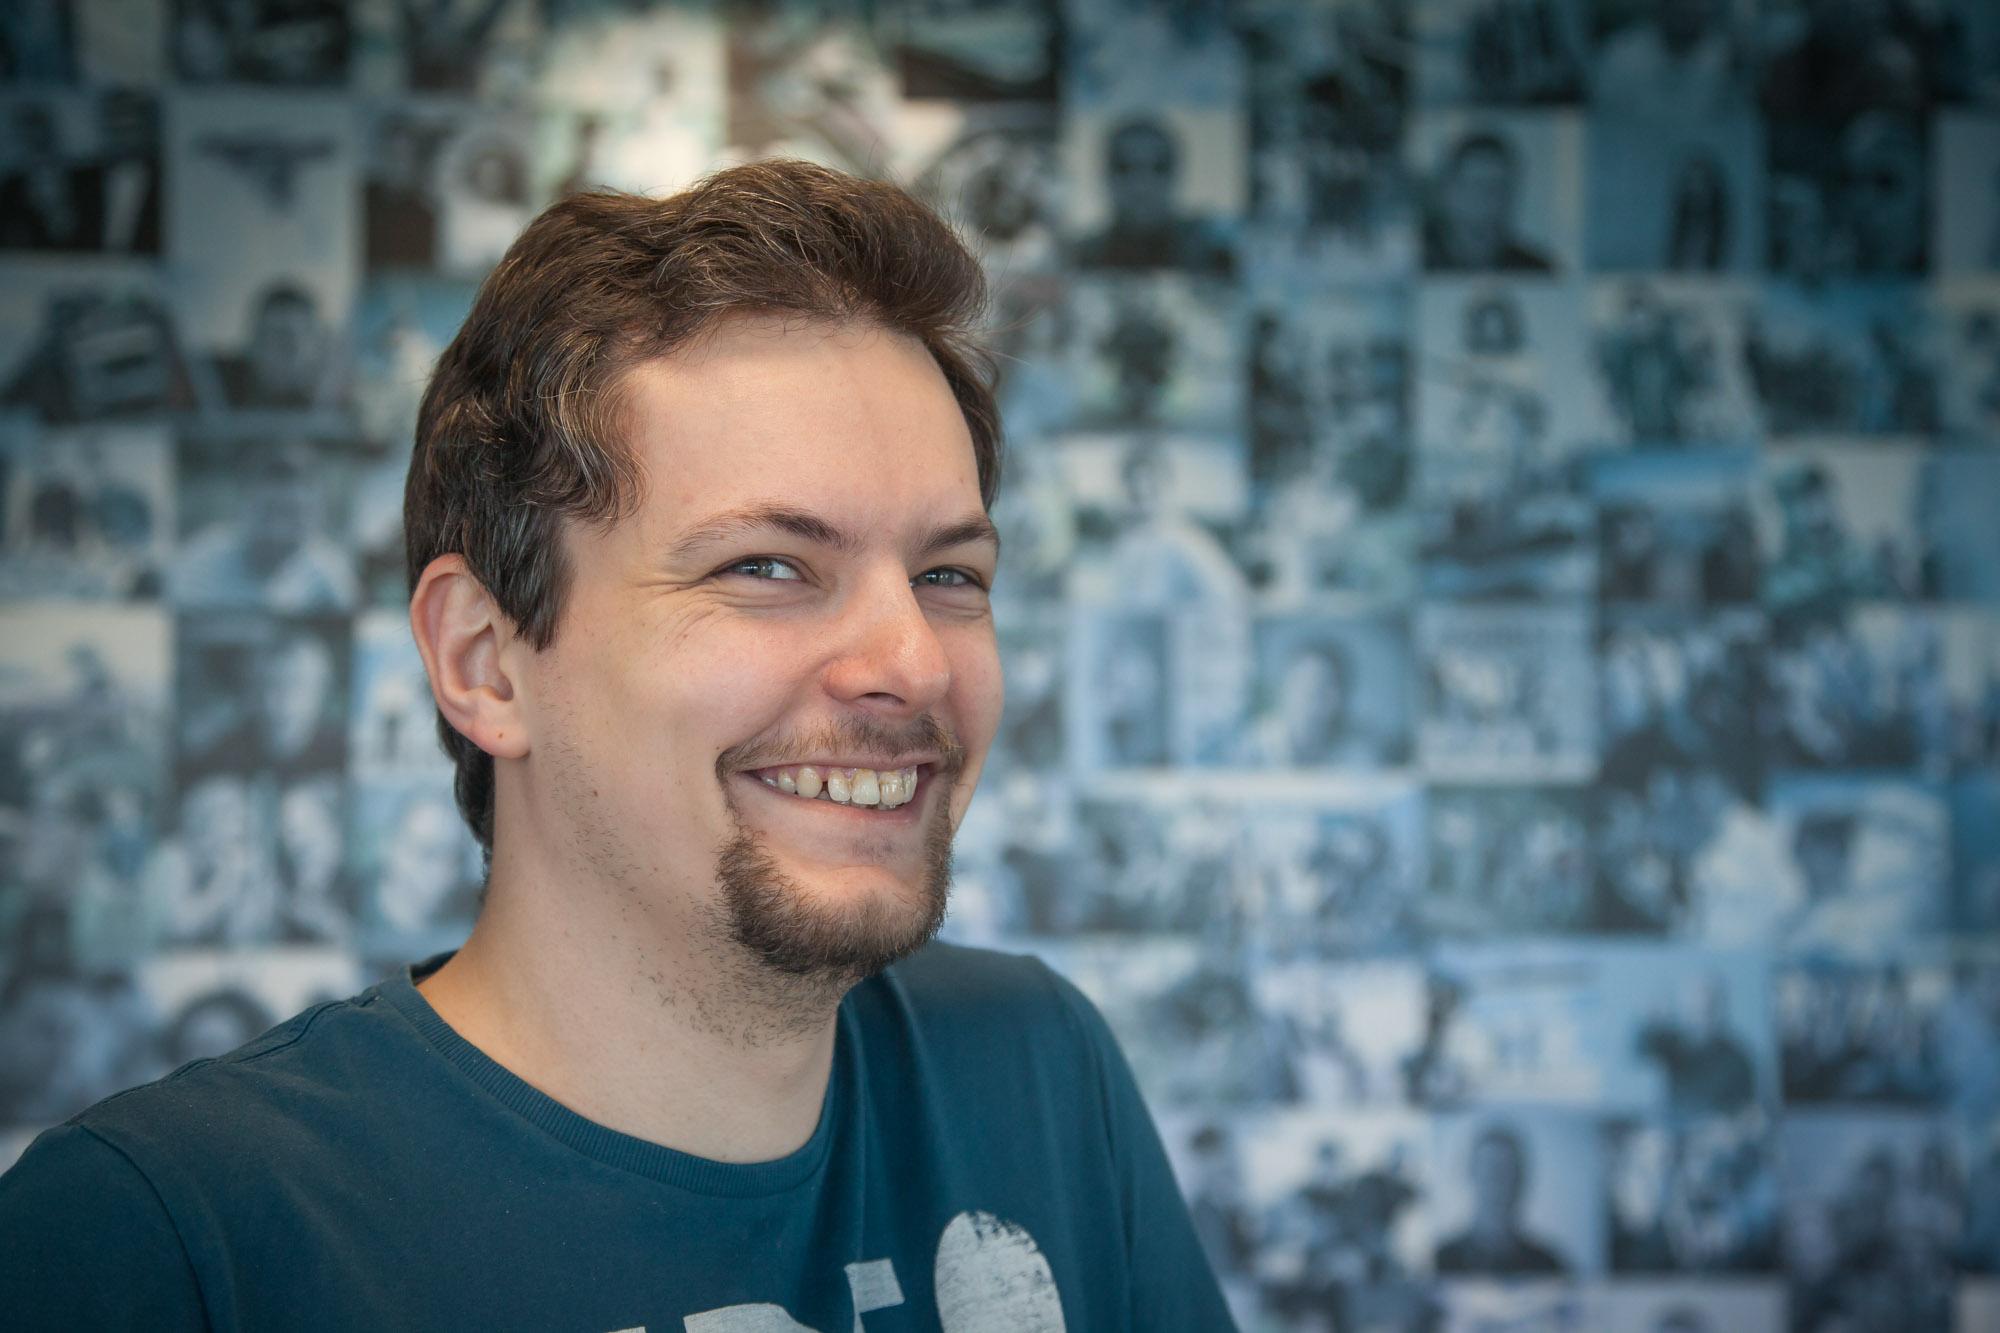 The happy winner: Jakub Wasilewski